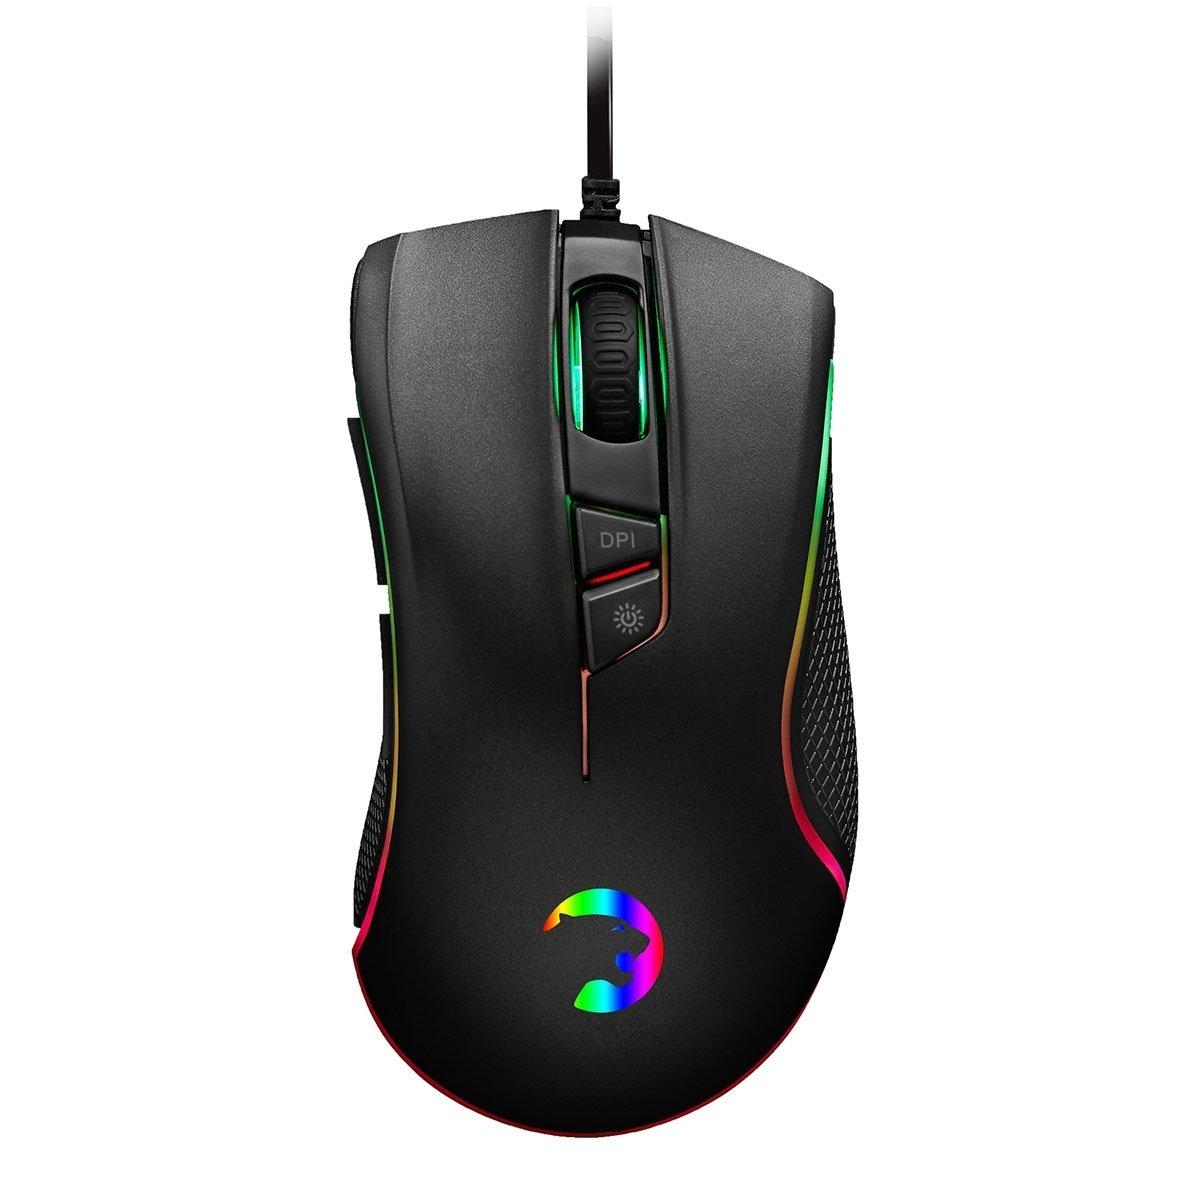 6b6c6bba237 Gamepower Bane RGB Gaming Mouse | Adeks Store